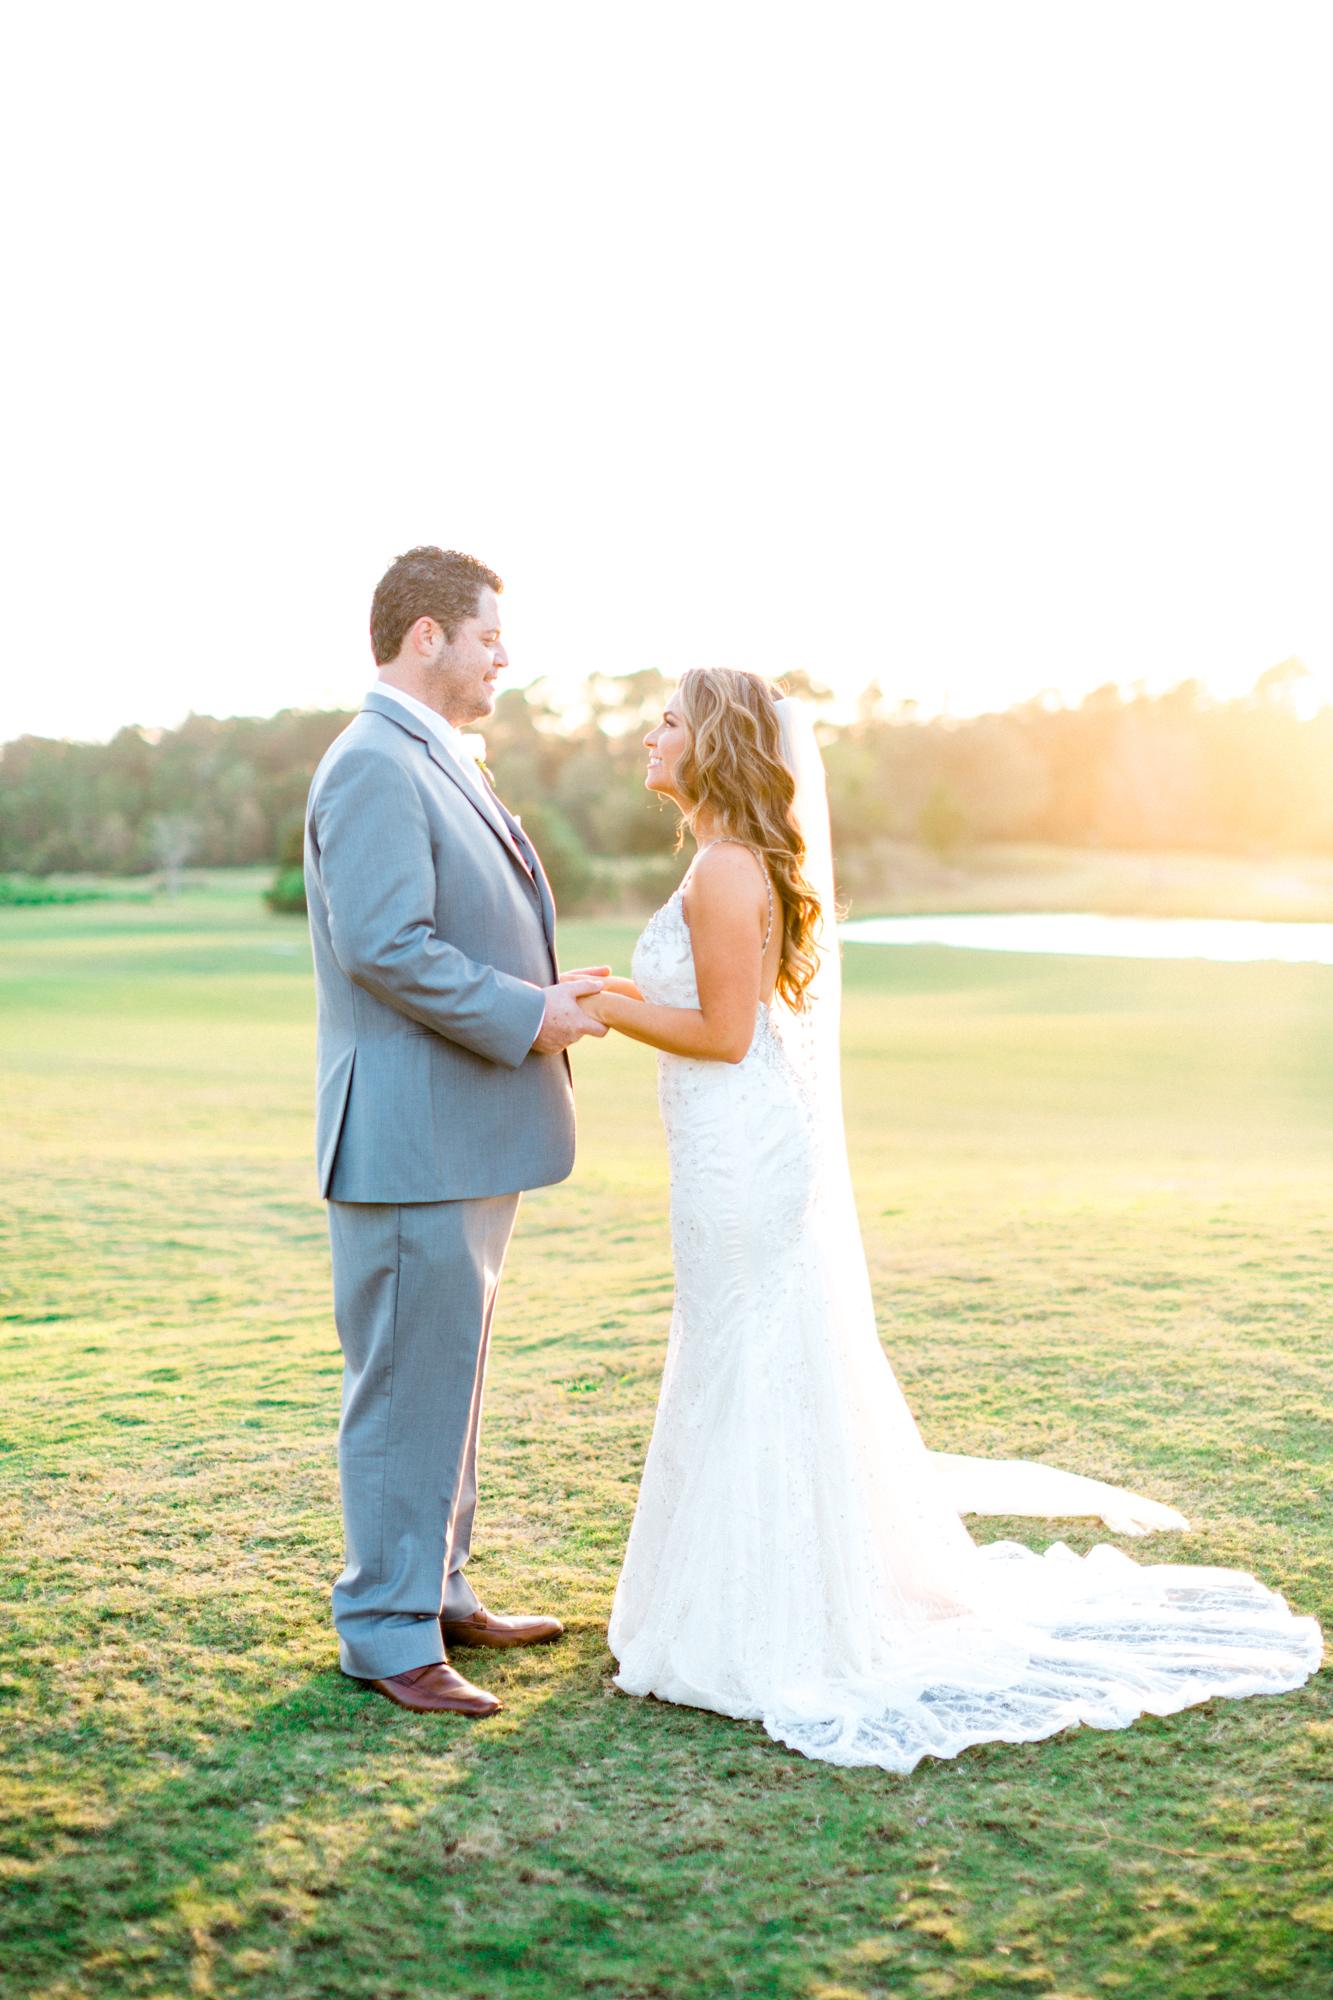 jessica-bellinger-photography-harmony-golf-preserve-wedding-photos-9370.jpg